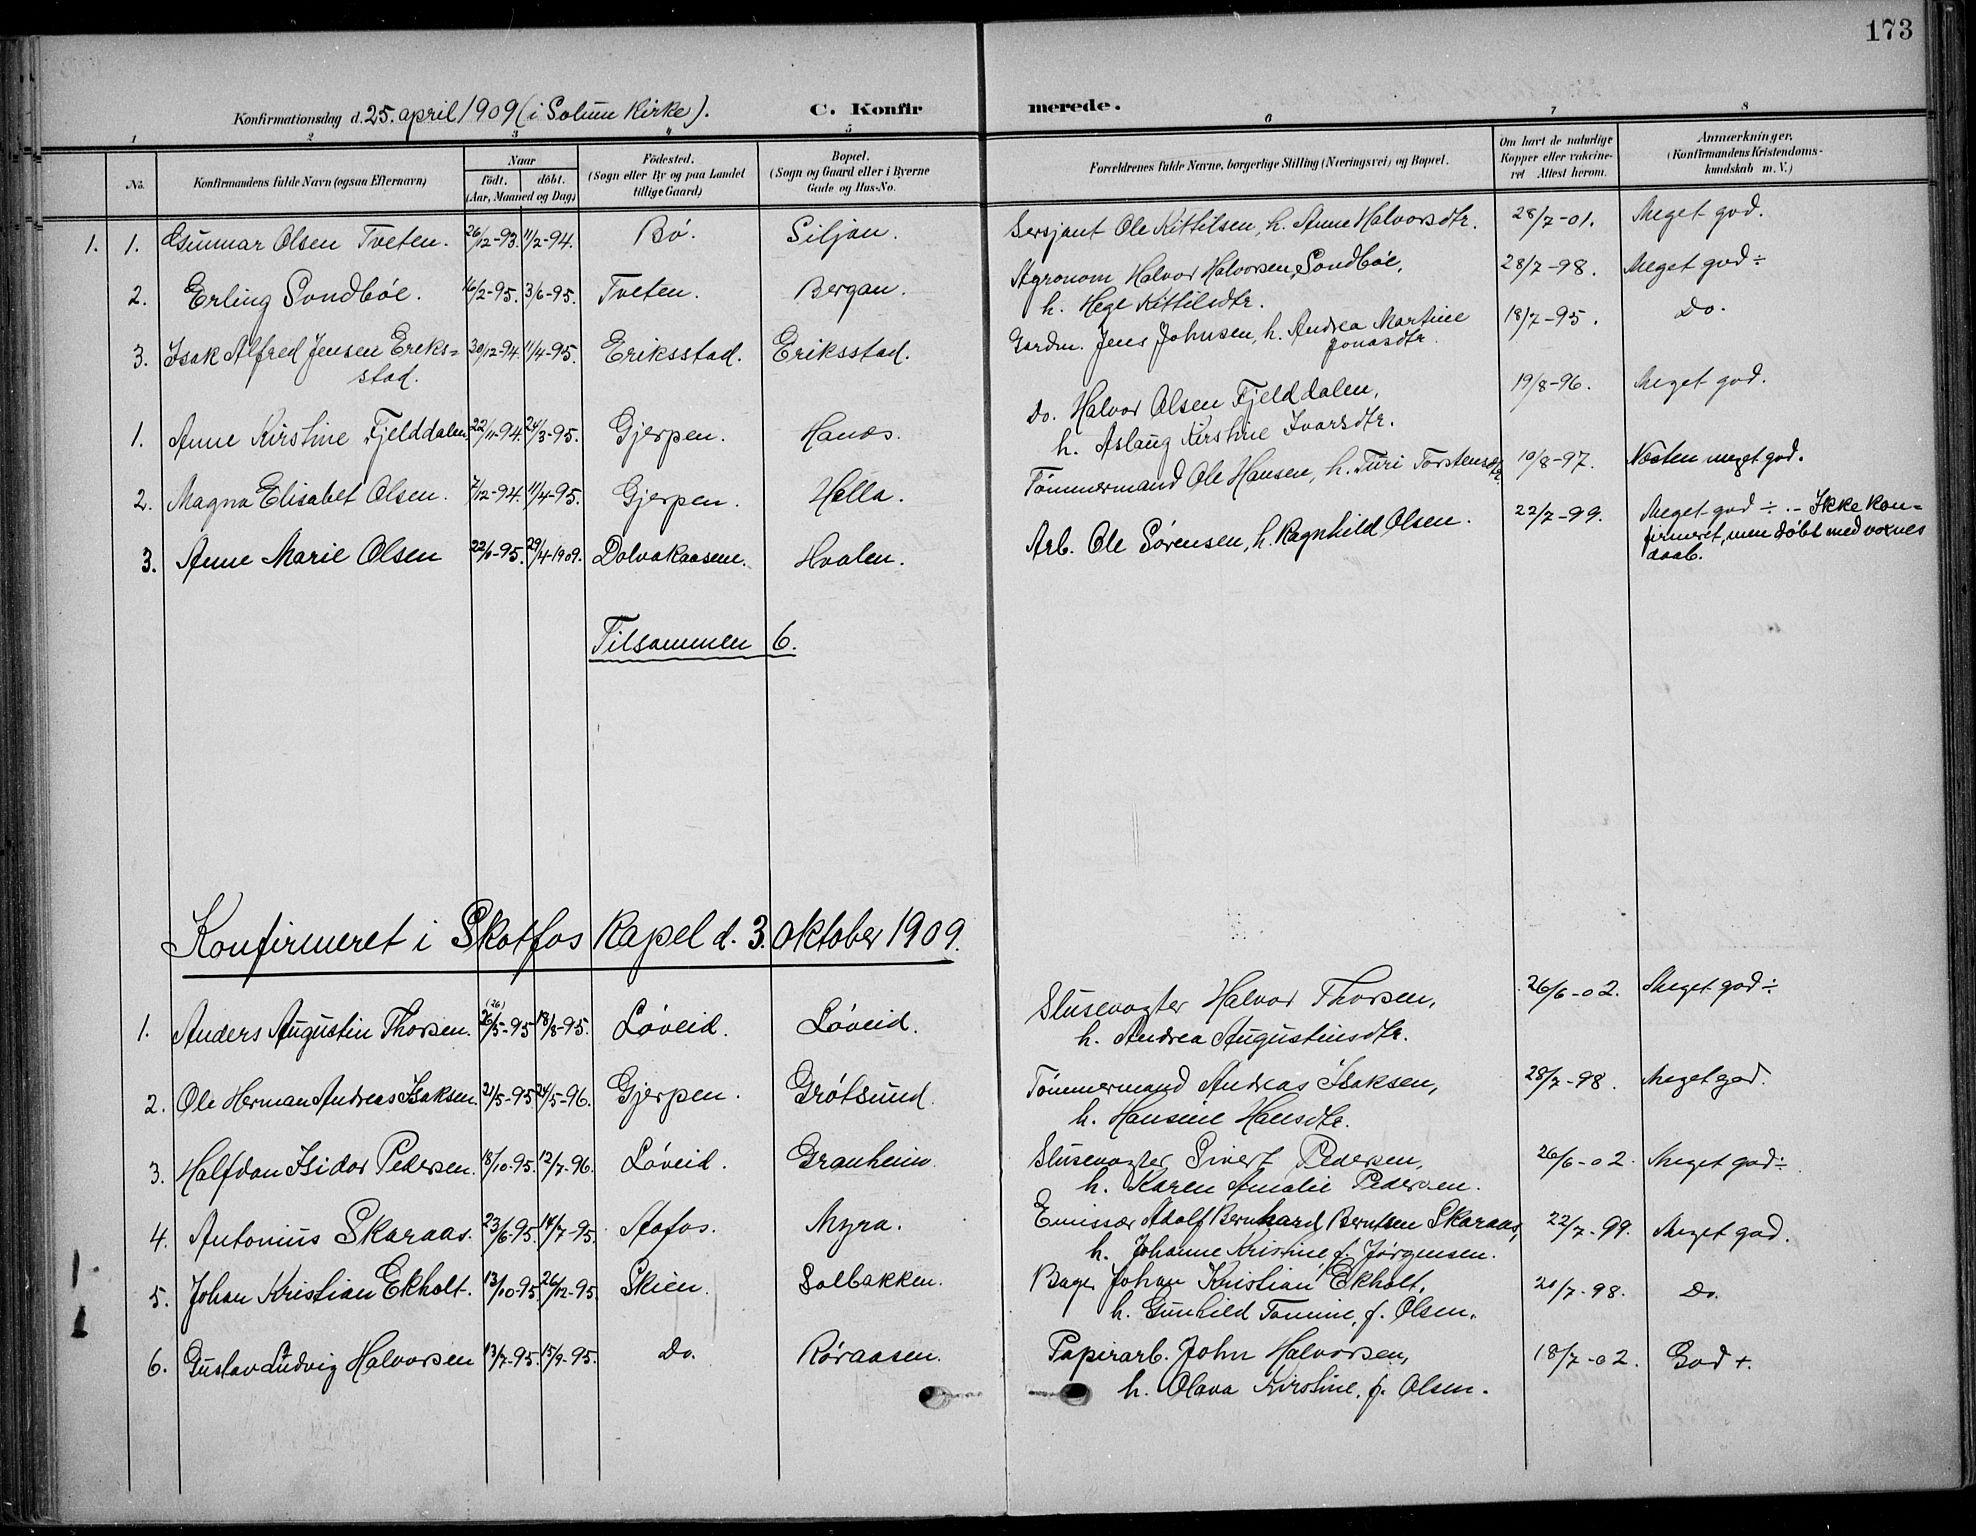 SAKO, Solum kirkebøker, F/Fb/L0003: Ministerialbok nr. II 3, 1901-1912, s. 173